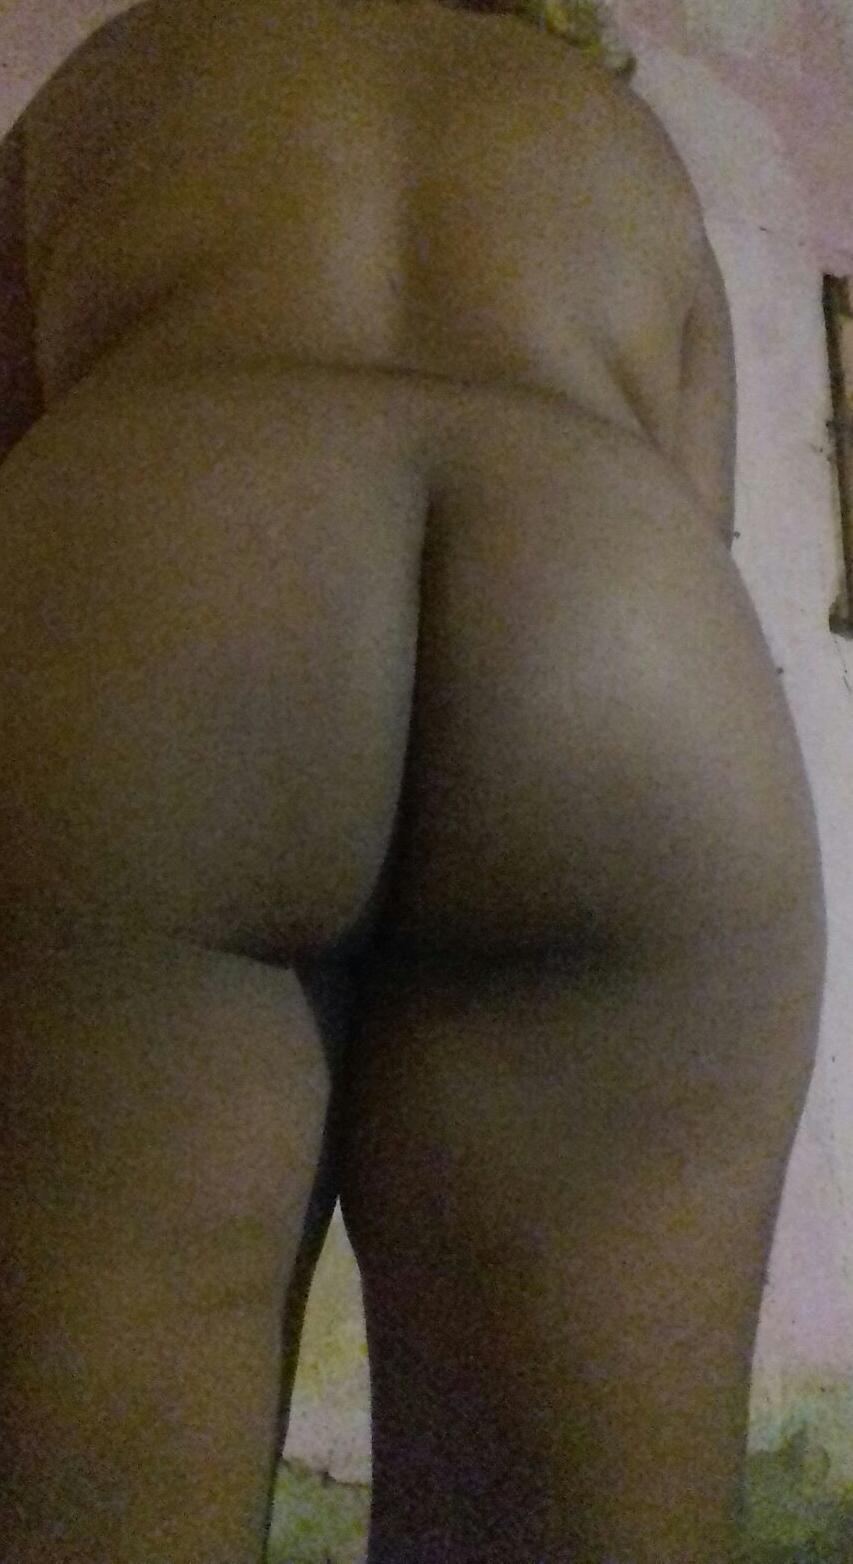 rica ama de casa desnuda xxx videos